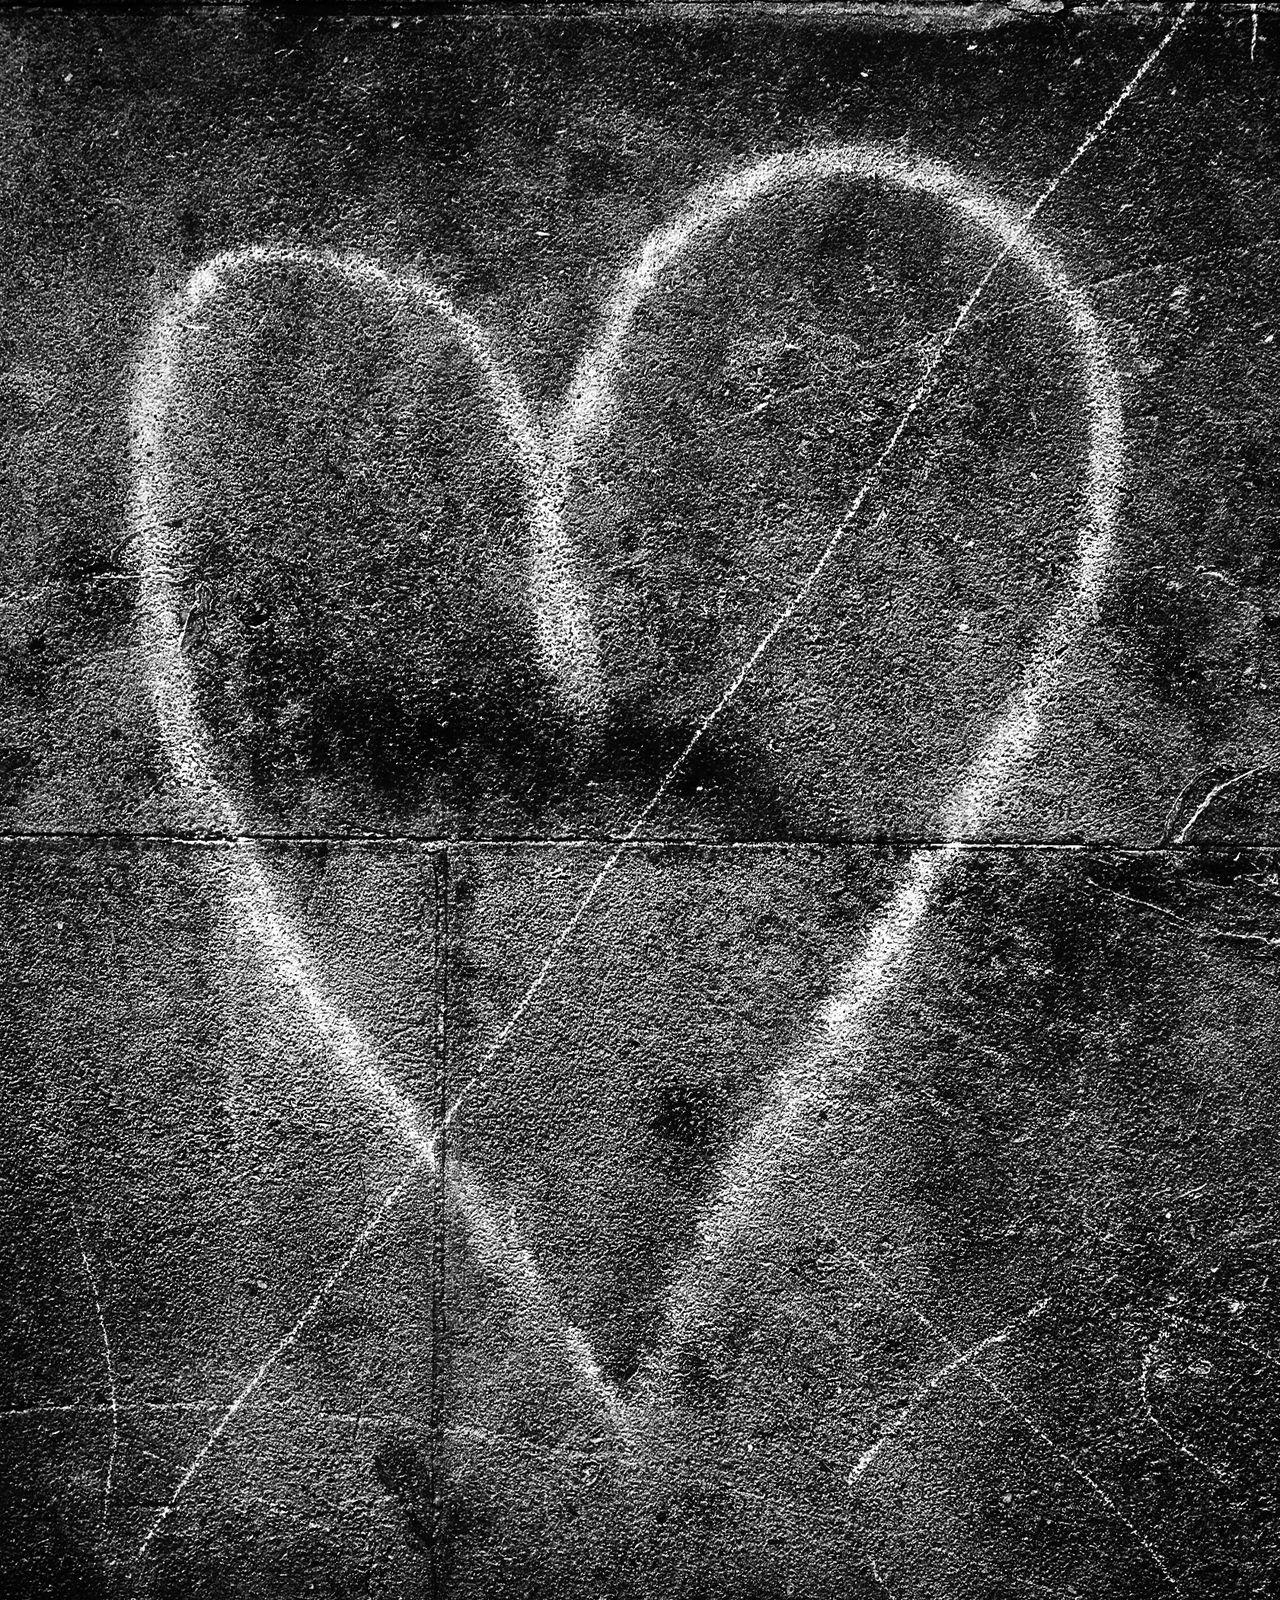 Blackandwhite Concrete Creativity Drawing - Art Product Drawn Graffiti Heart Shape Love Monochrome Monochrome Photography MonochromePhotography Shape Sigma Dp2 Urban Valentine